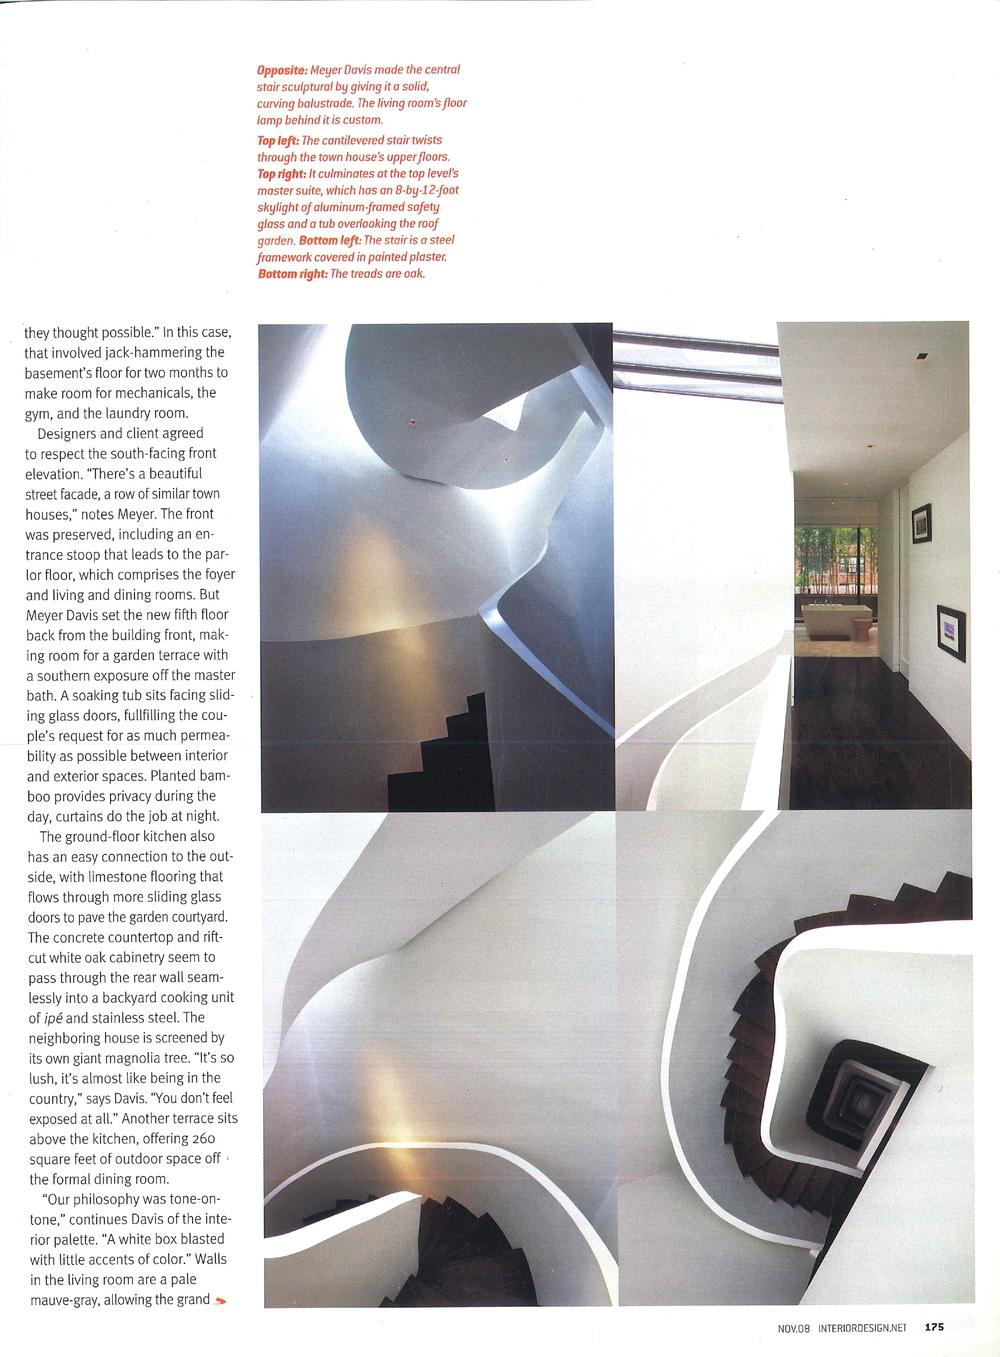 Interior Design Magazine_Nov 2008-6.jpg